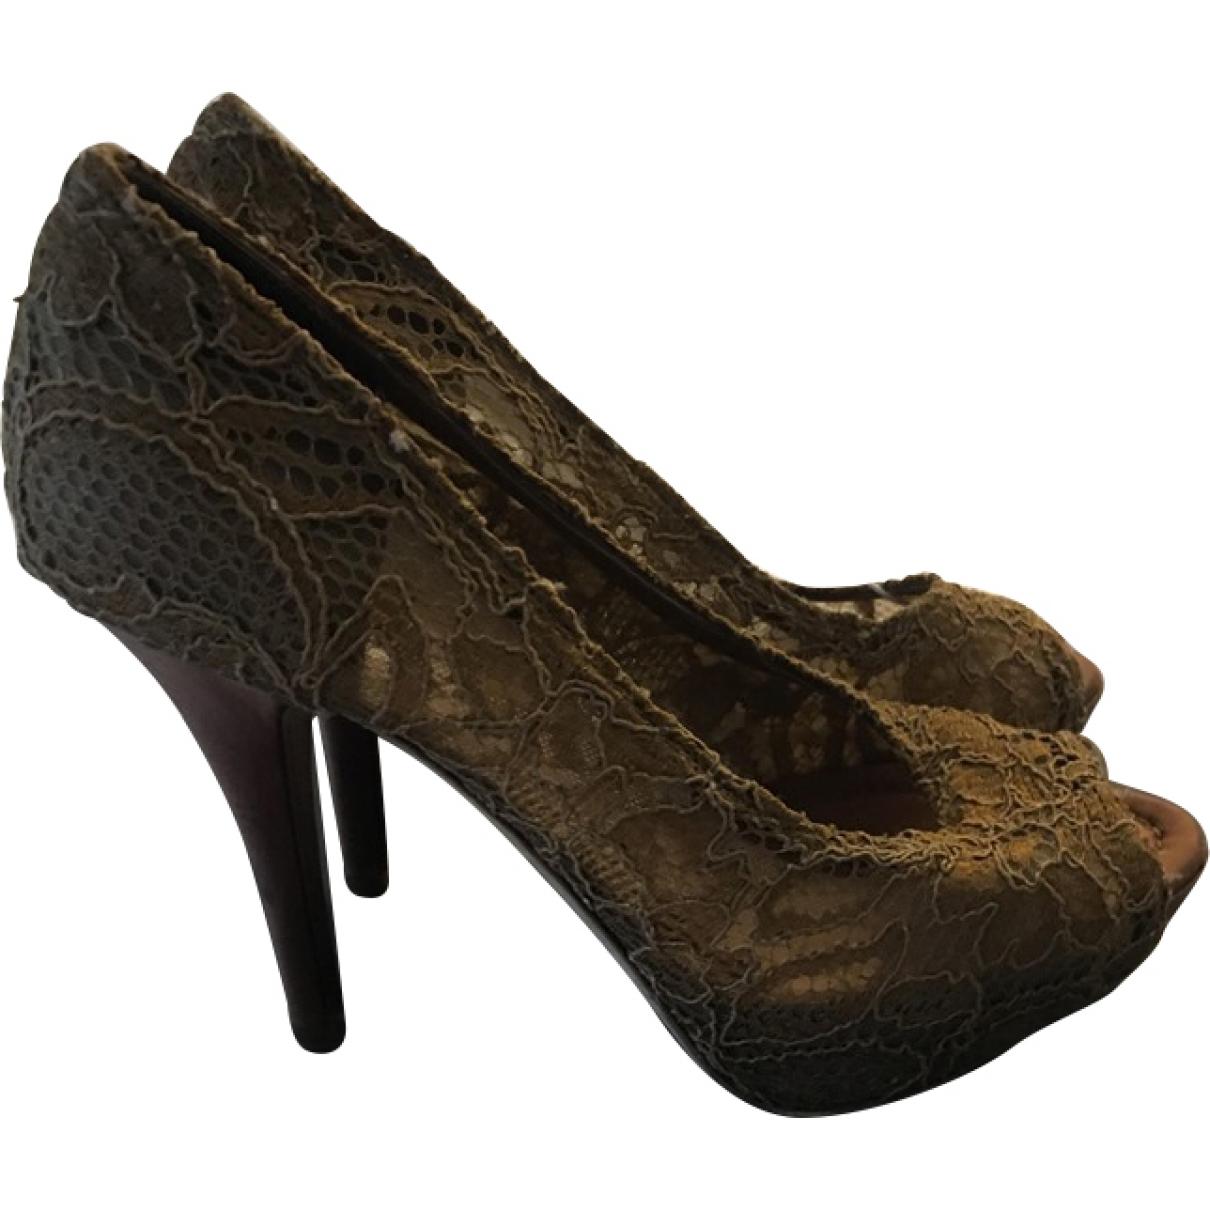 Dolce & Gabbana \N Brown Leather Heels for Women 38 EU